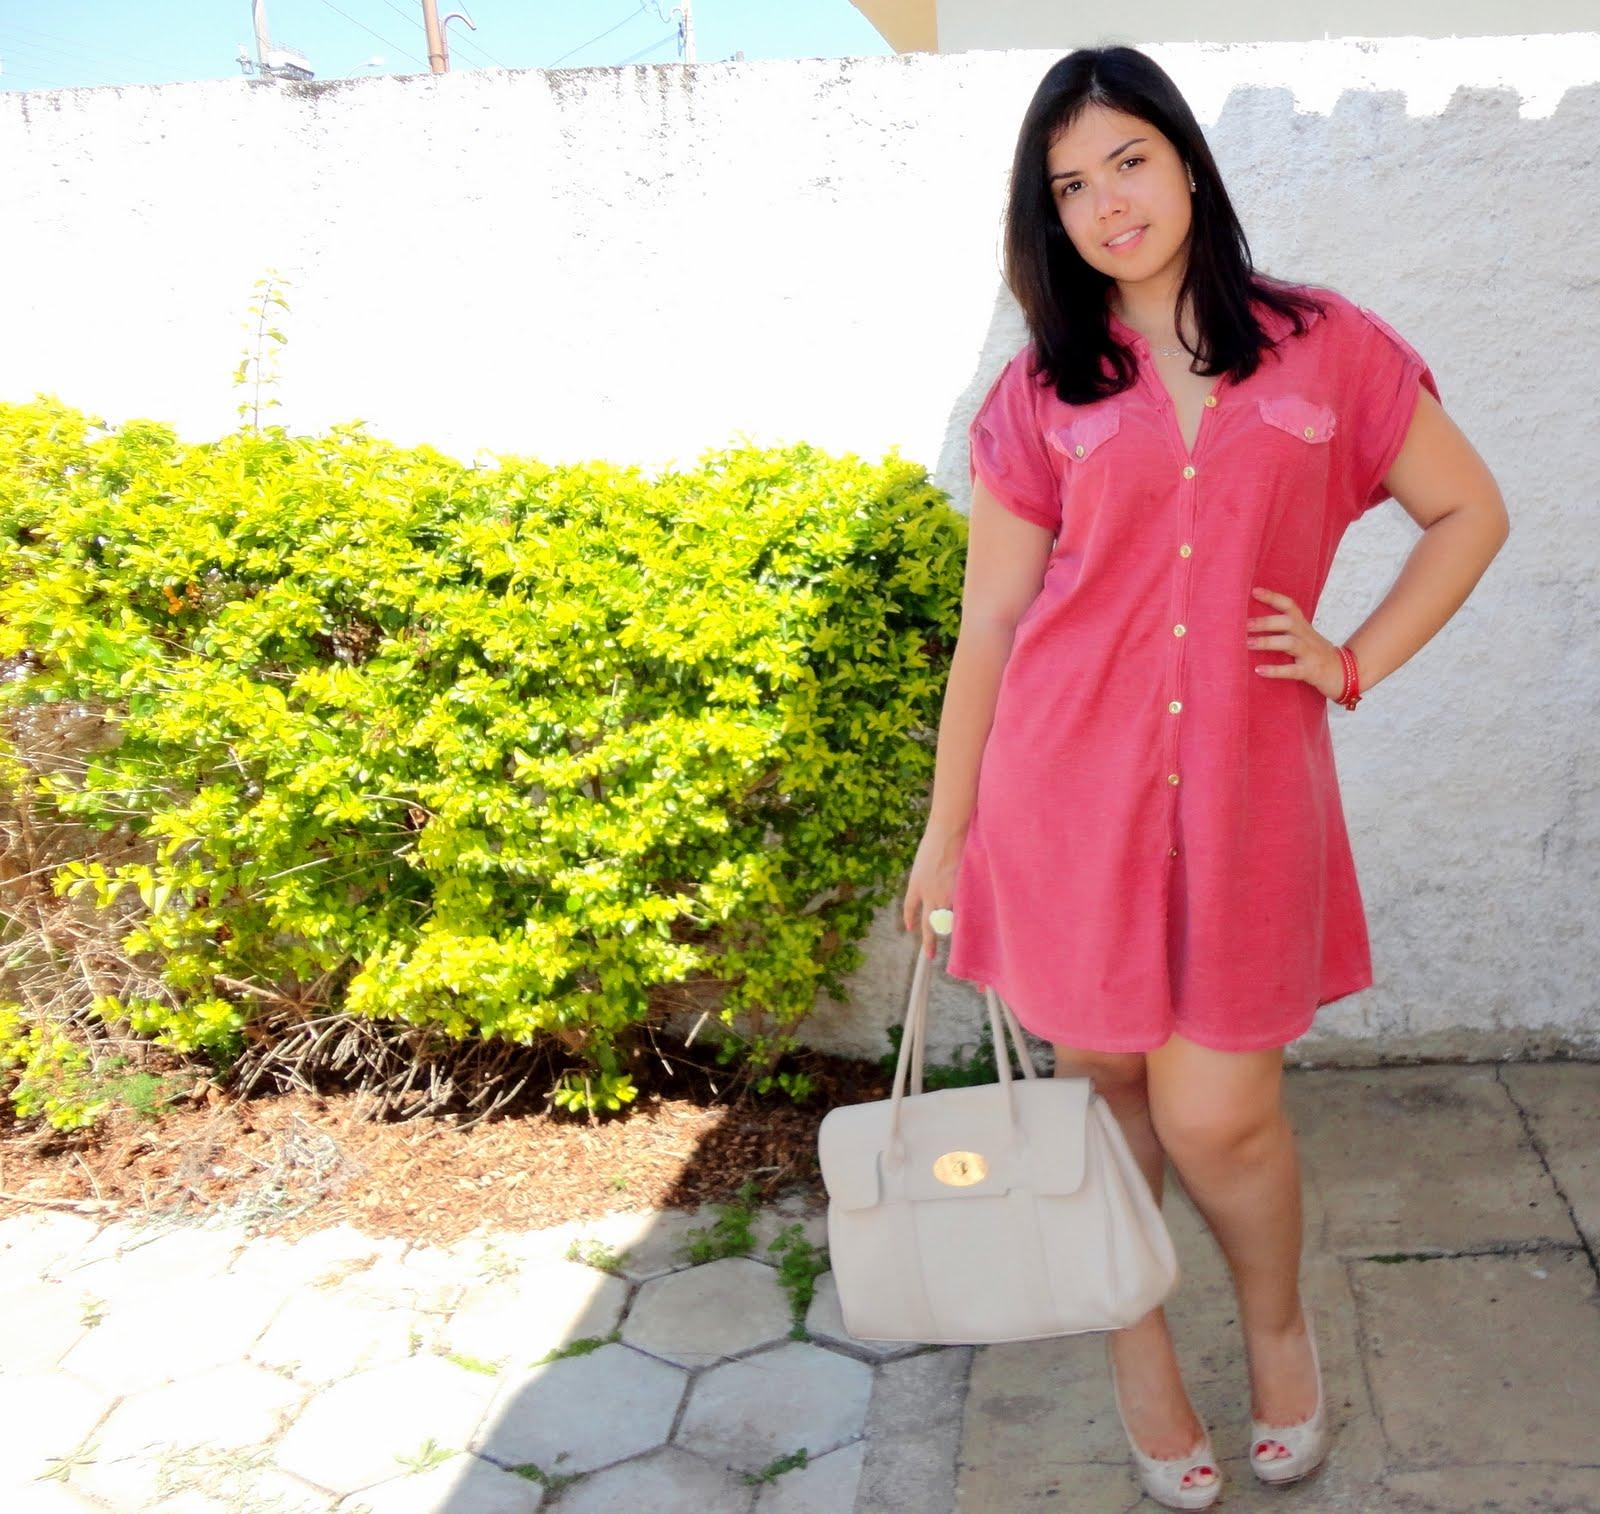 http://1.bp.blogspot.com/-KymG5pRlC5U/TmV9bzfP42I/AAAAAAAACck/uxr23LaRSRE/s1600/moda+look+vestido+farm+peeptoe+schutz+bolsa+mulberry+2.jpg